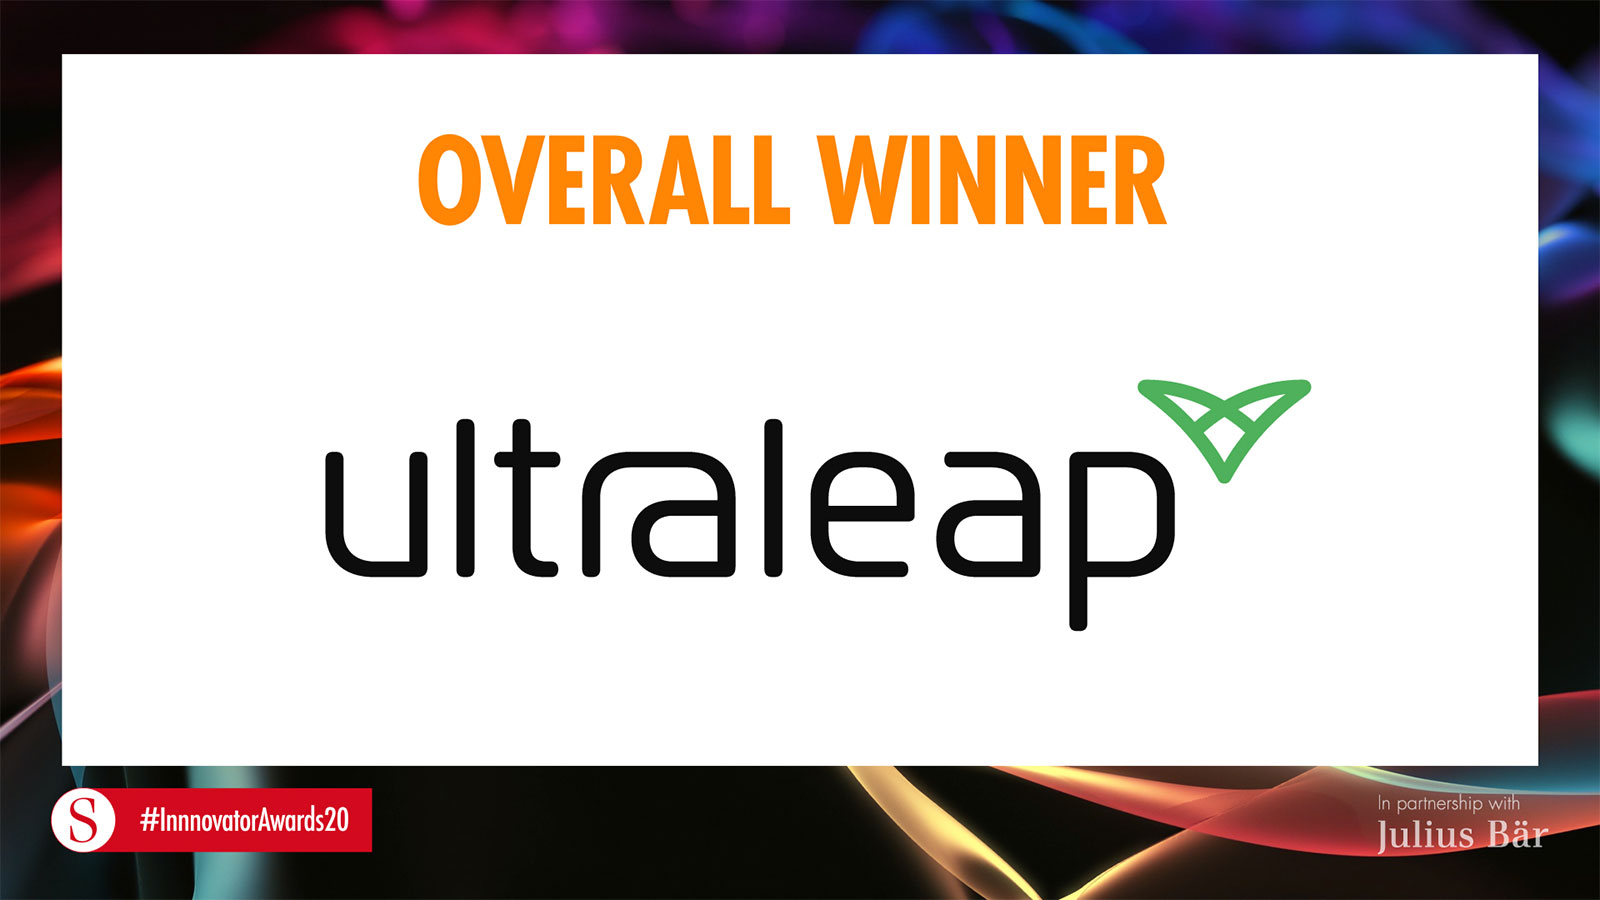 ultraleap-wins-spectator-award